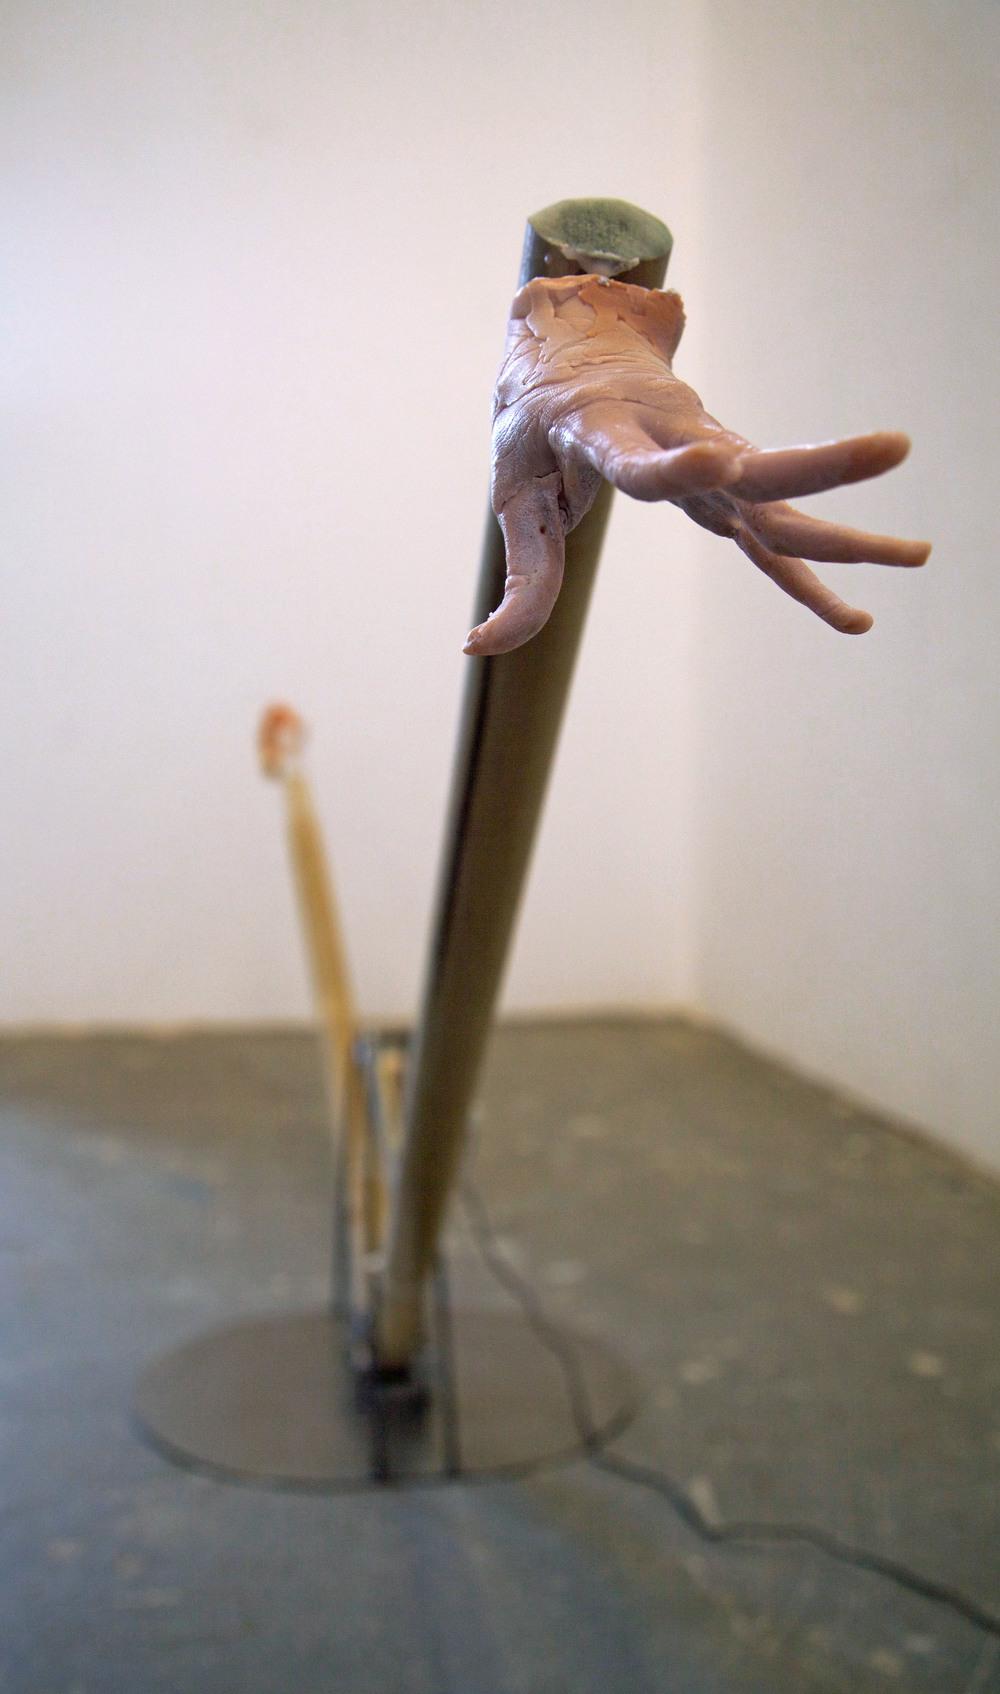 Balancing Hands - Big Science 2.jpg